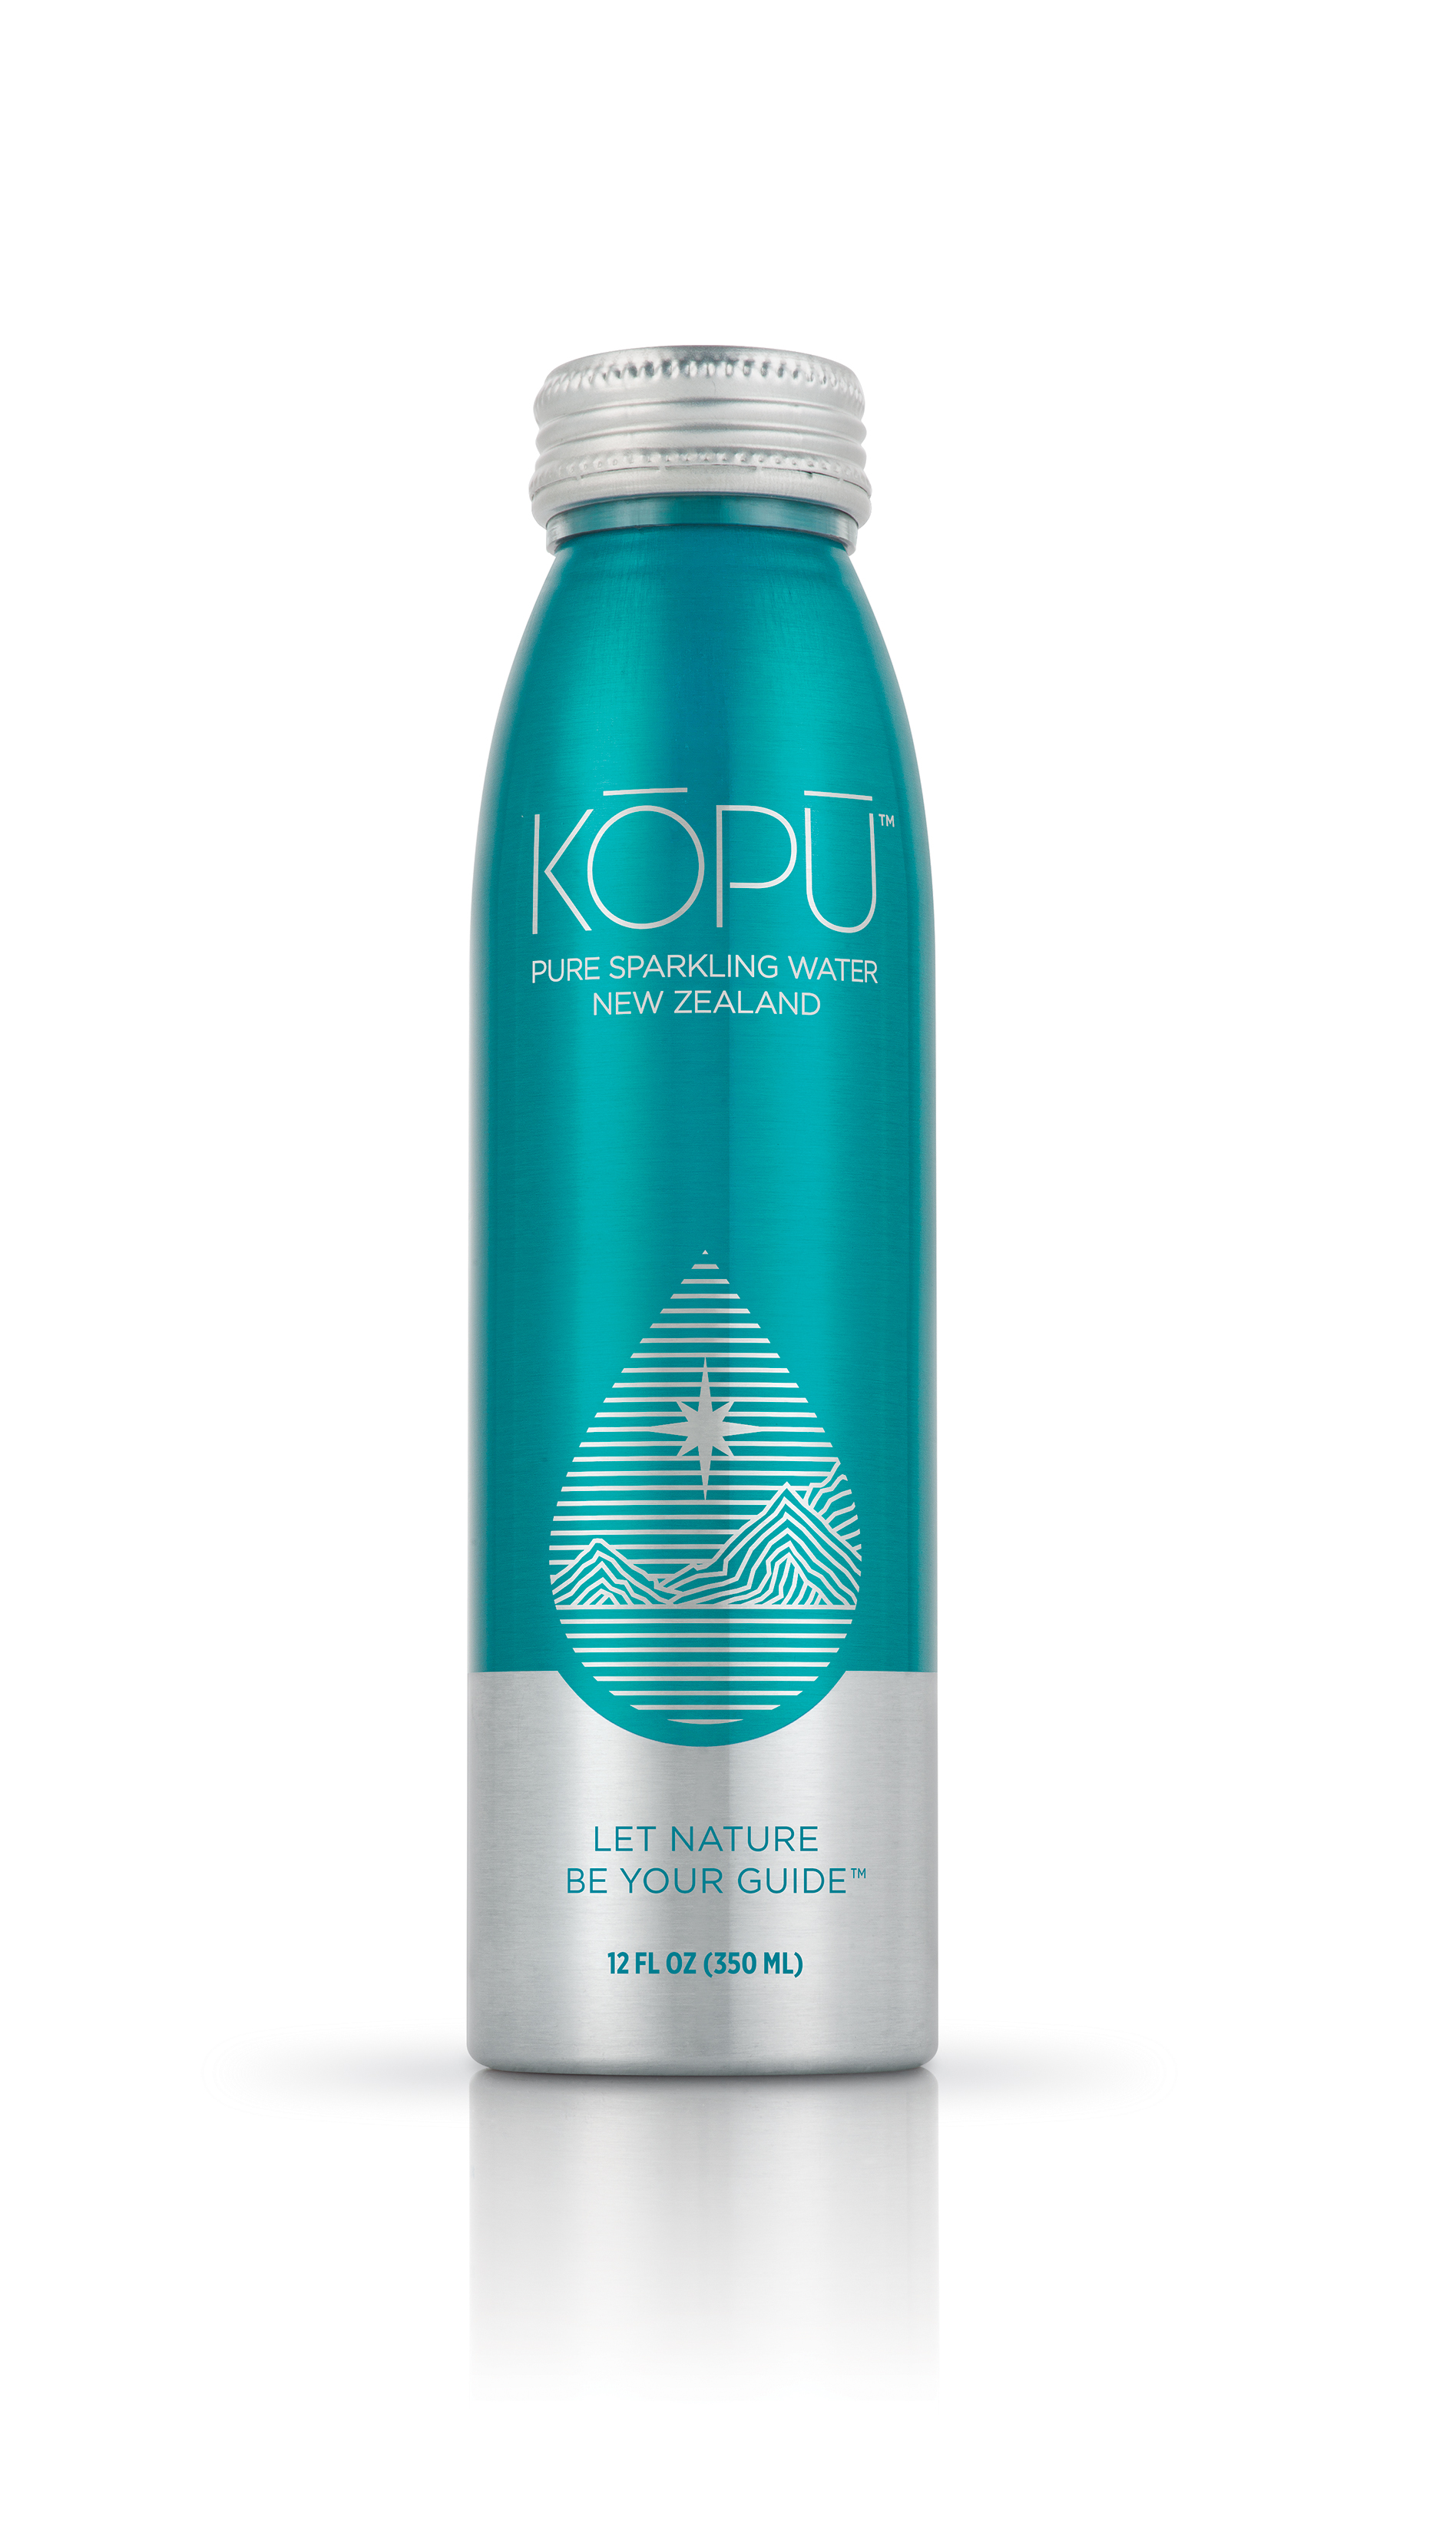 Kopu Pure Sparkling Water